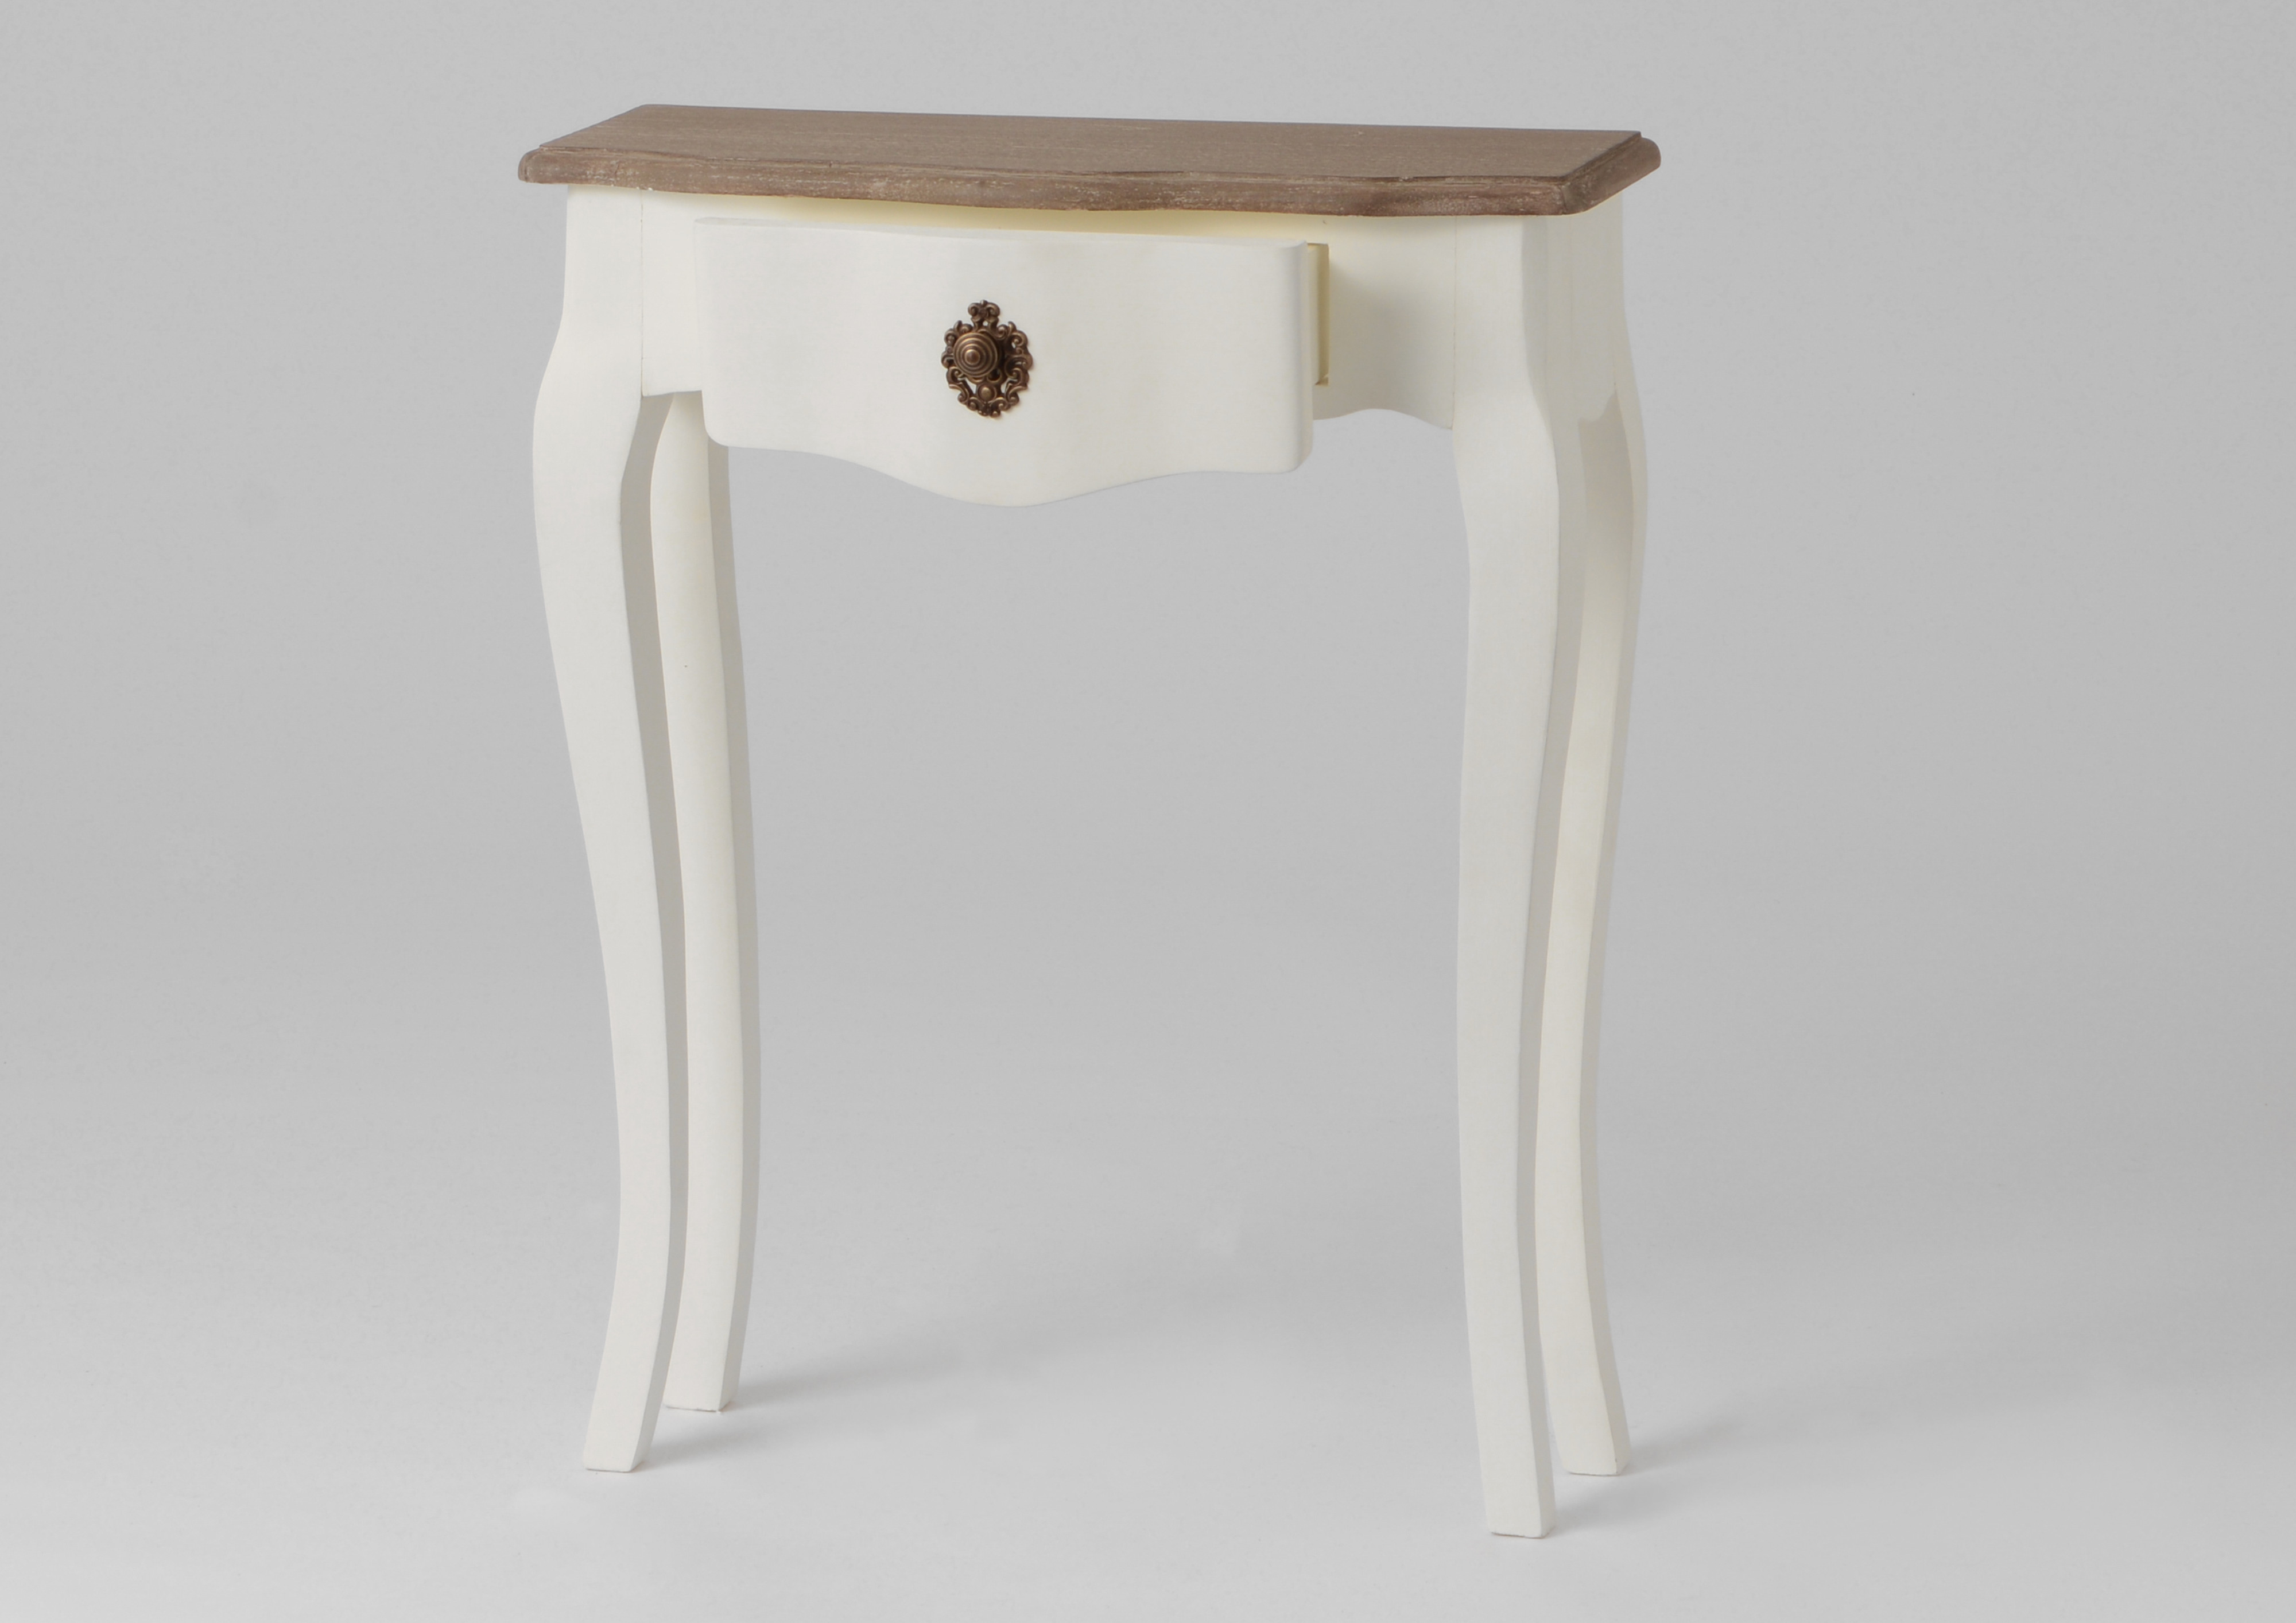 Console de Table Baroque Tiroirs Marqueterie Bois Mur